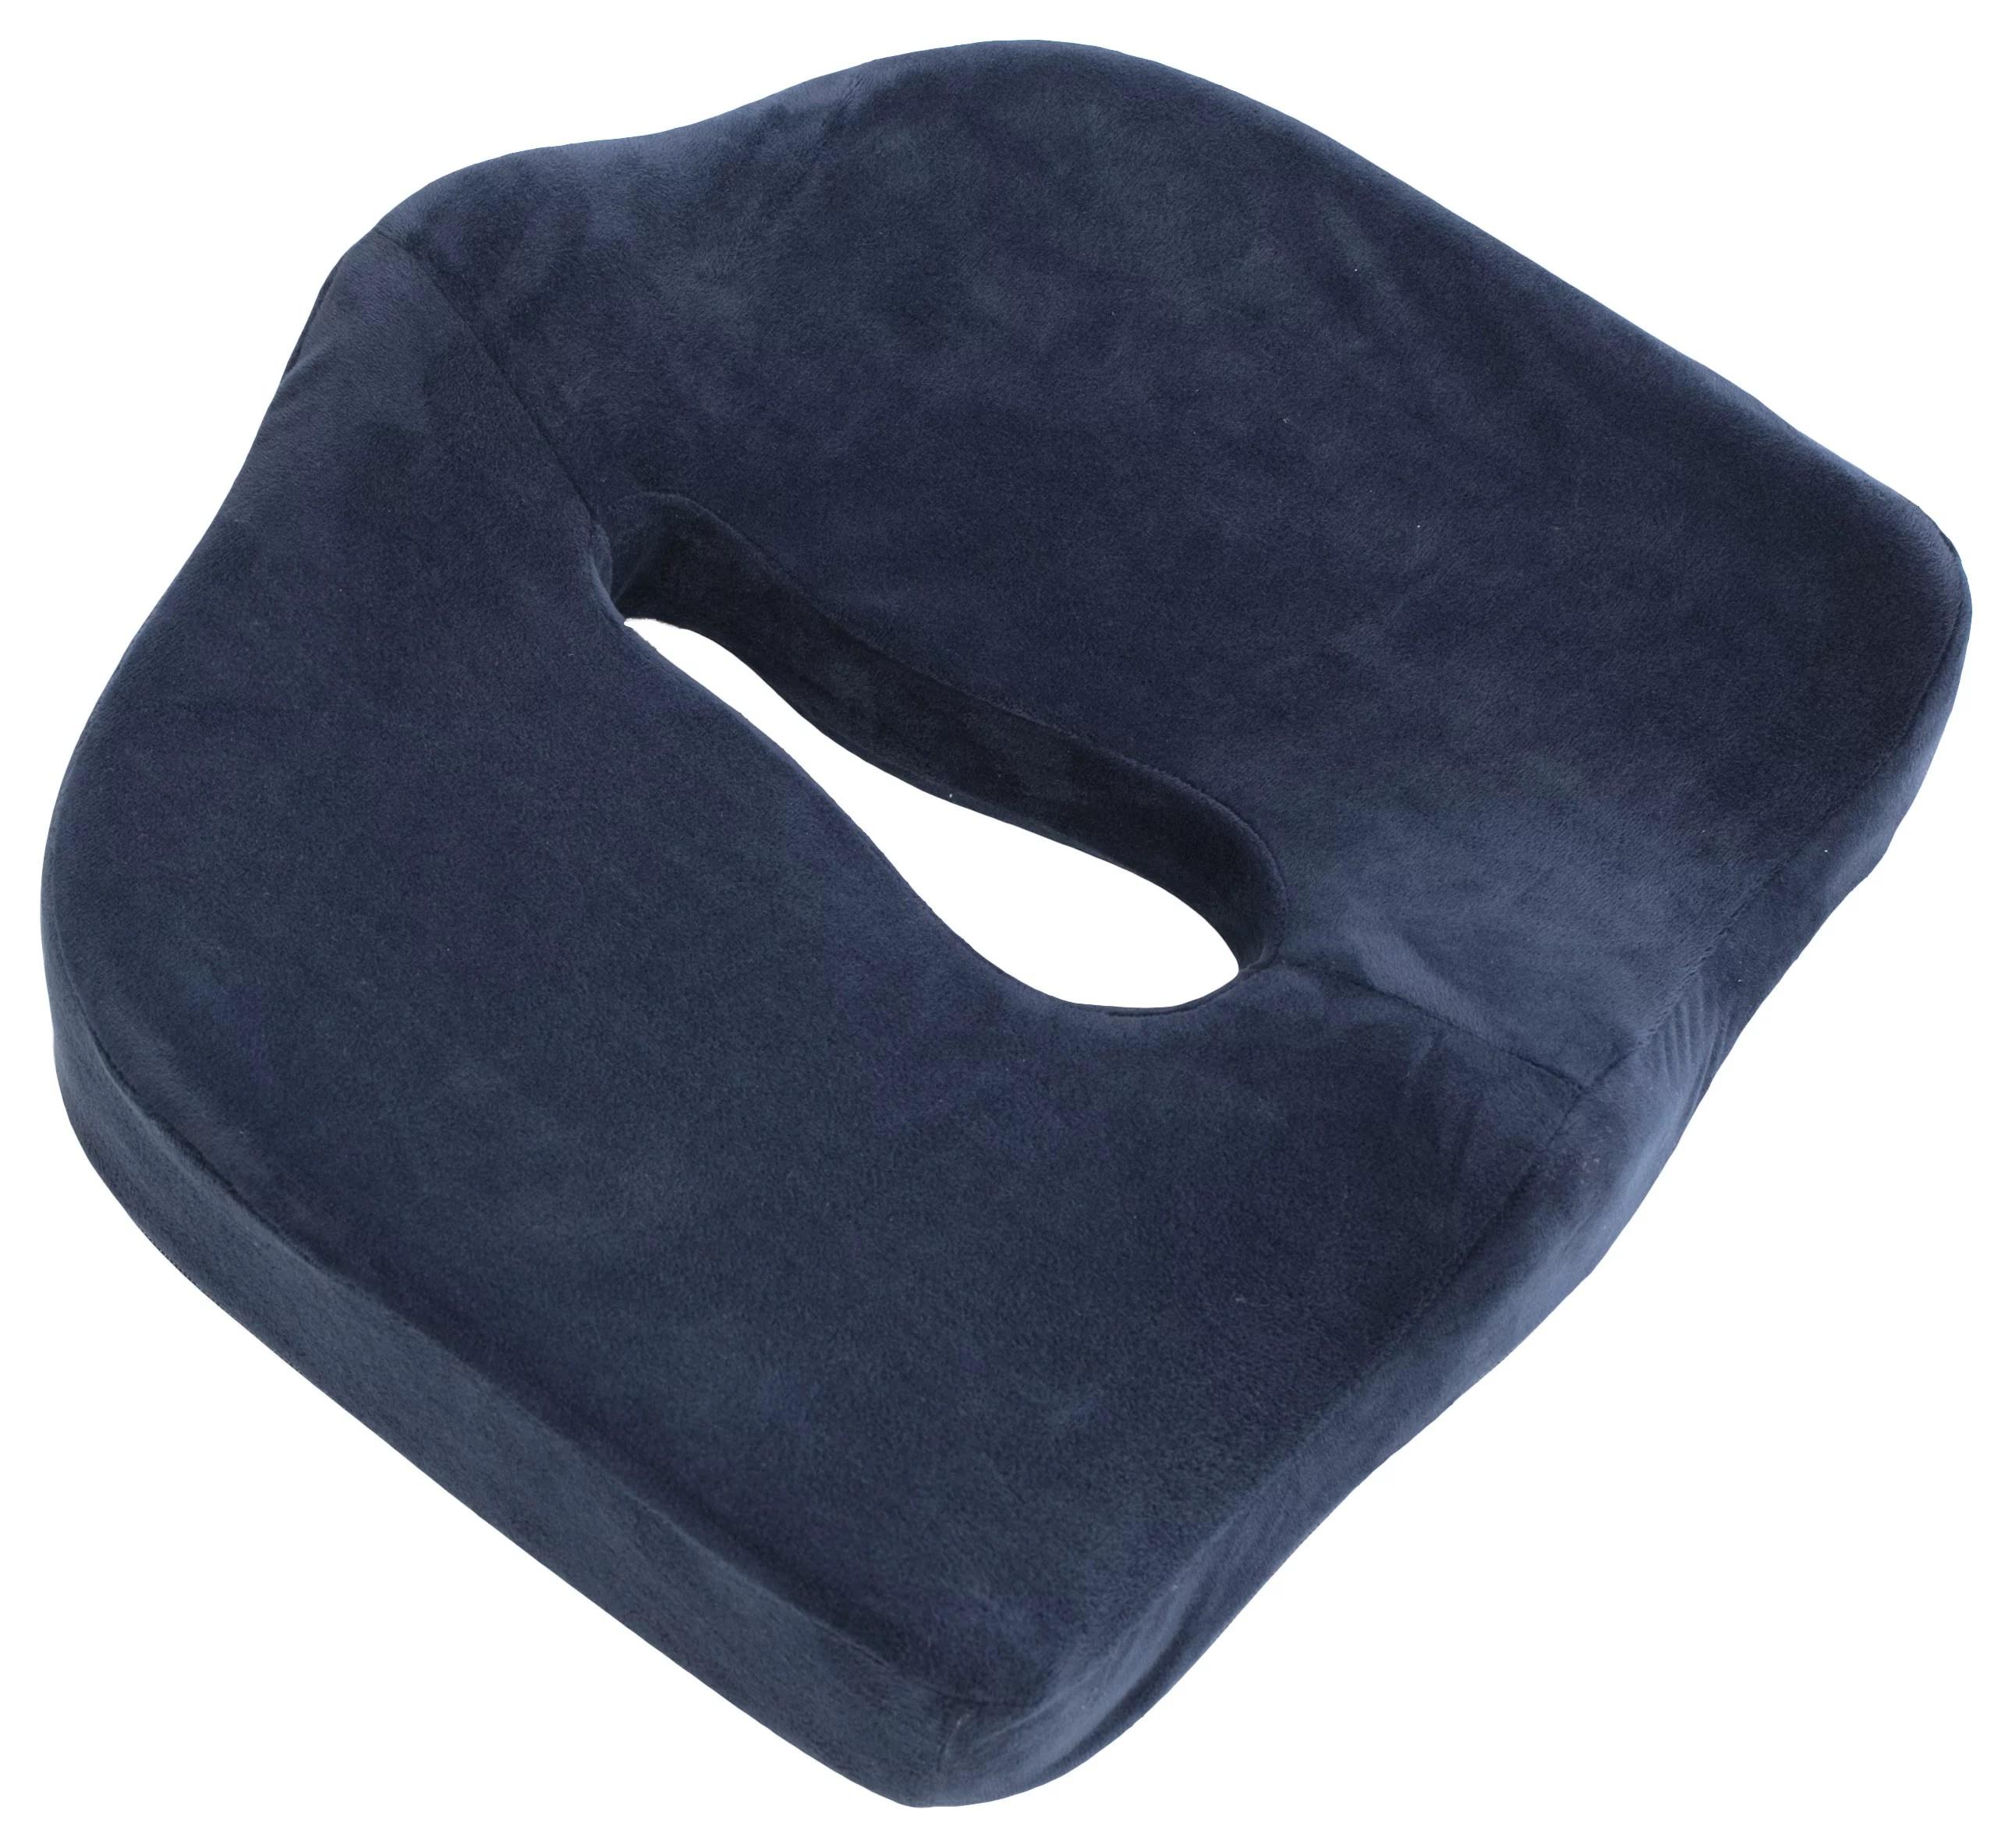 deluxe comfort sciatica cushion for coccydynia pain